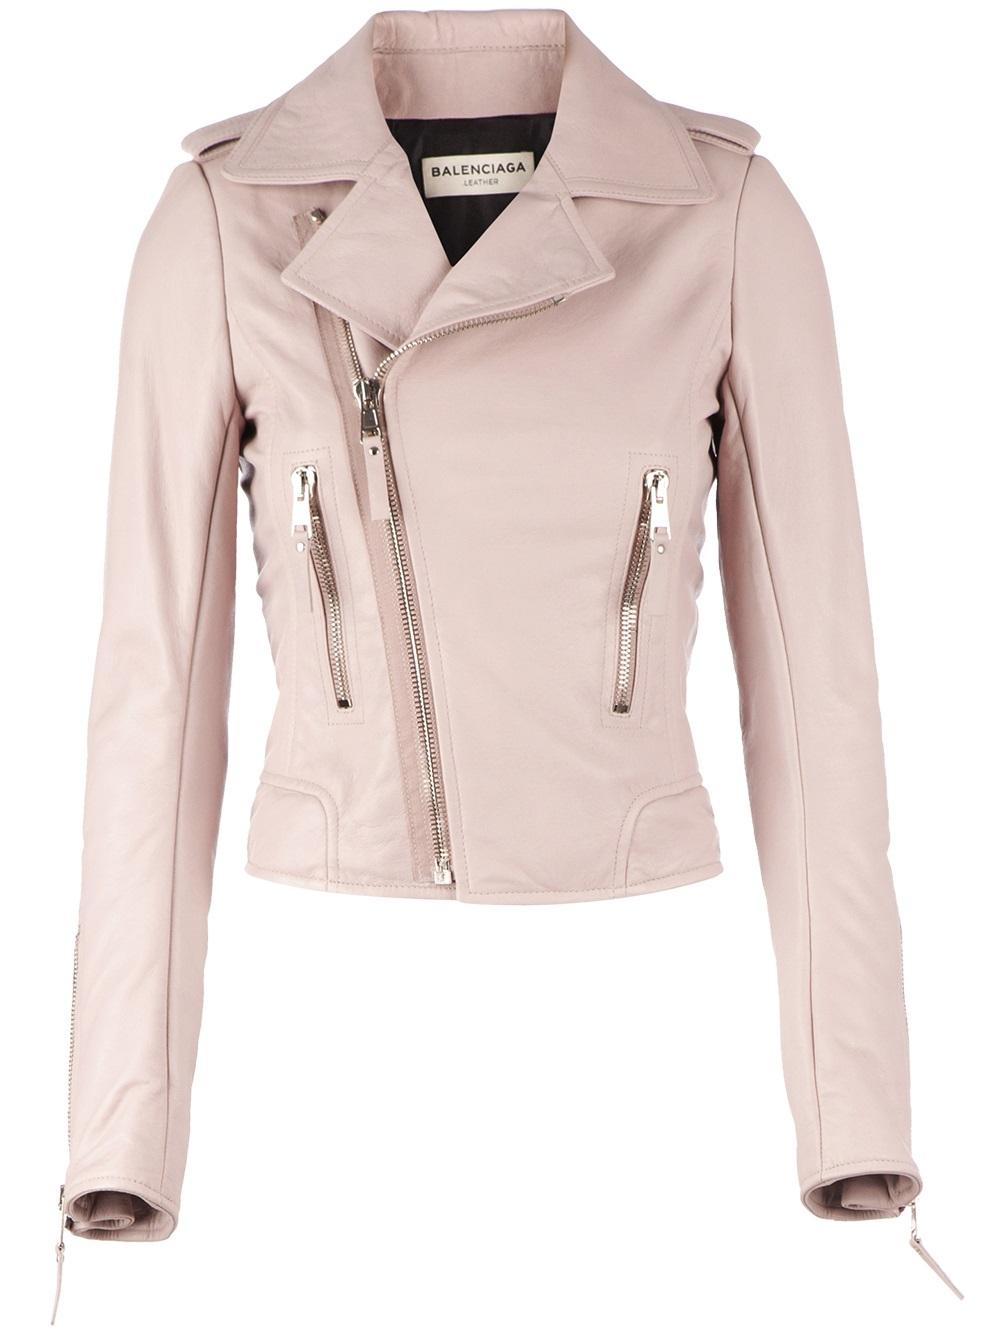 Balenciaga Biker Jacket in Pink | Lyst